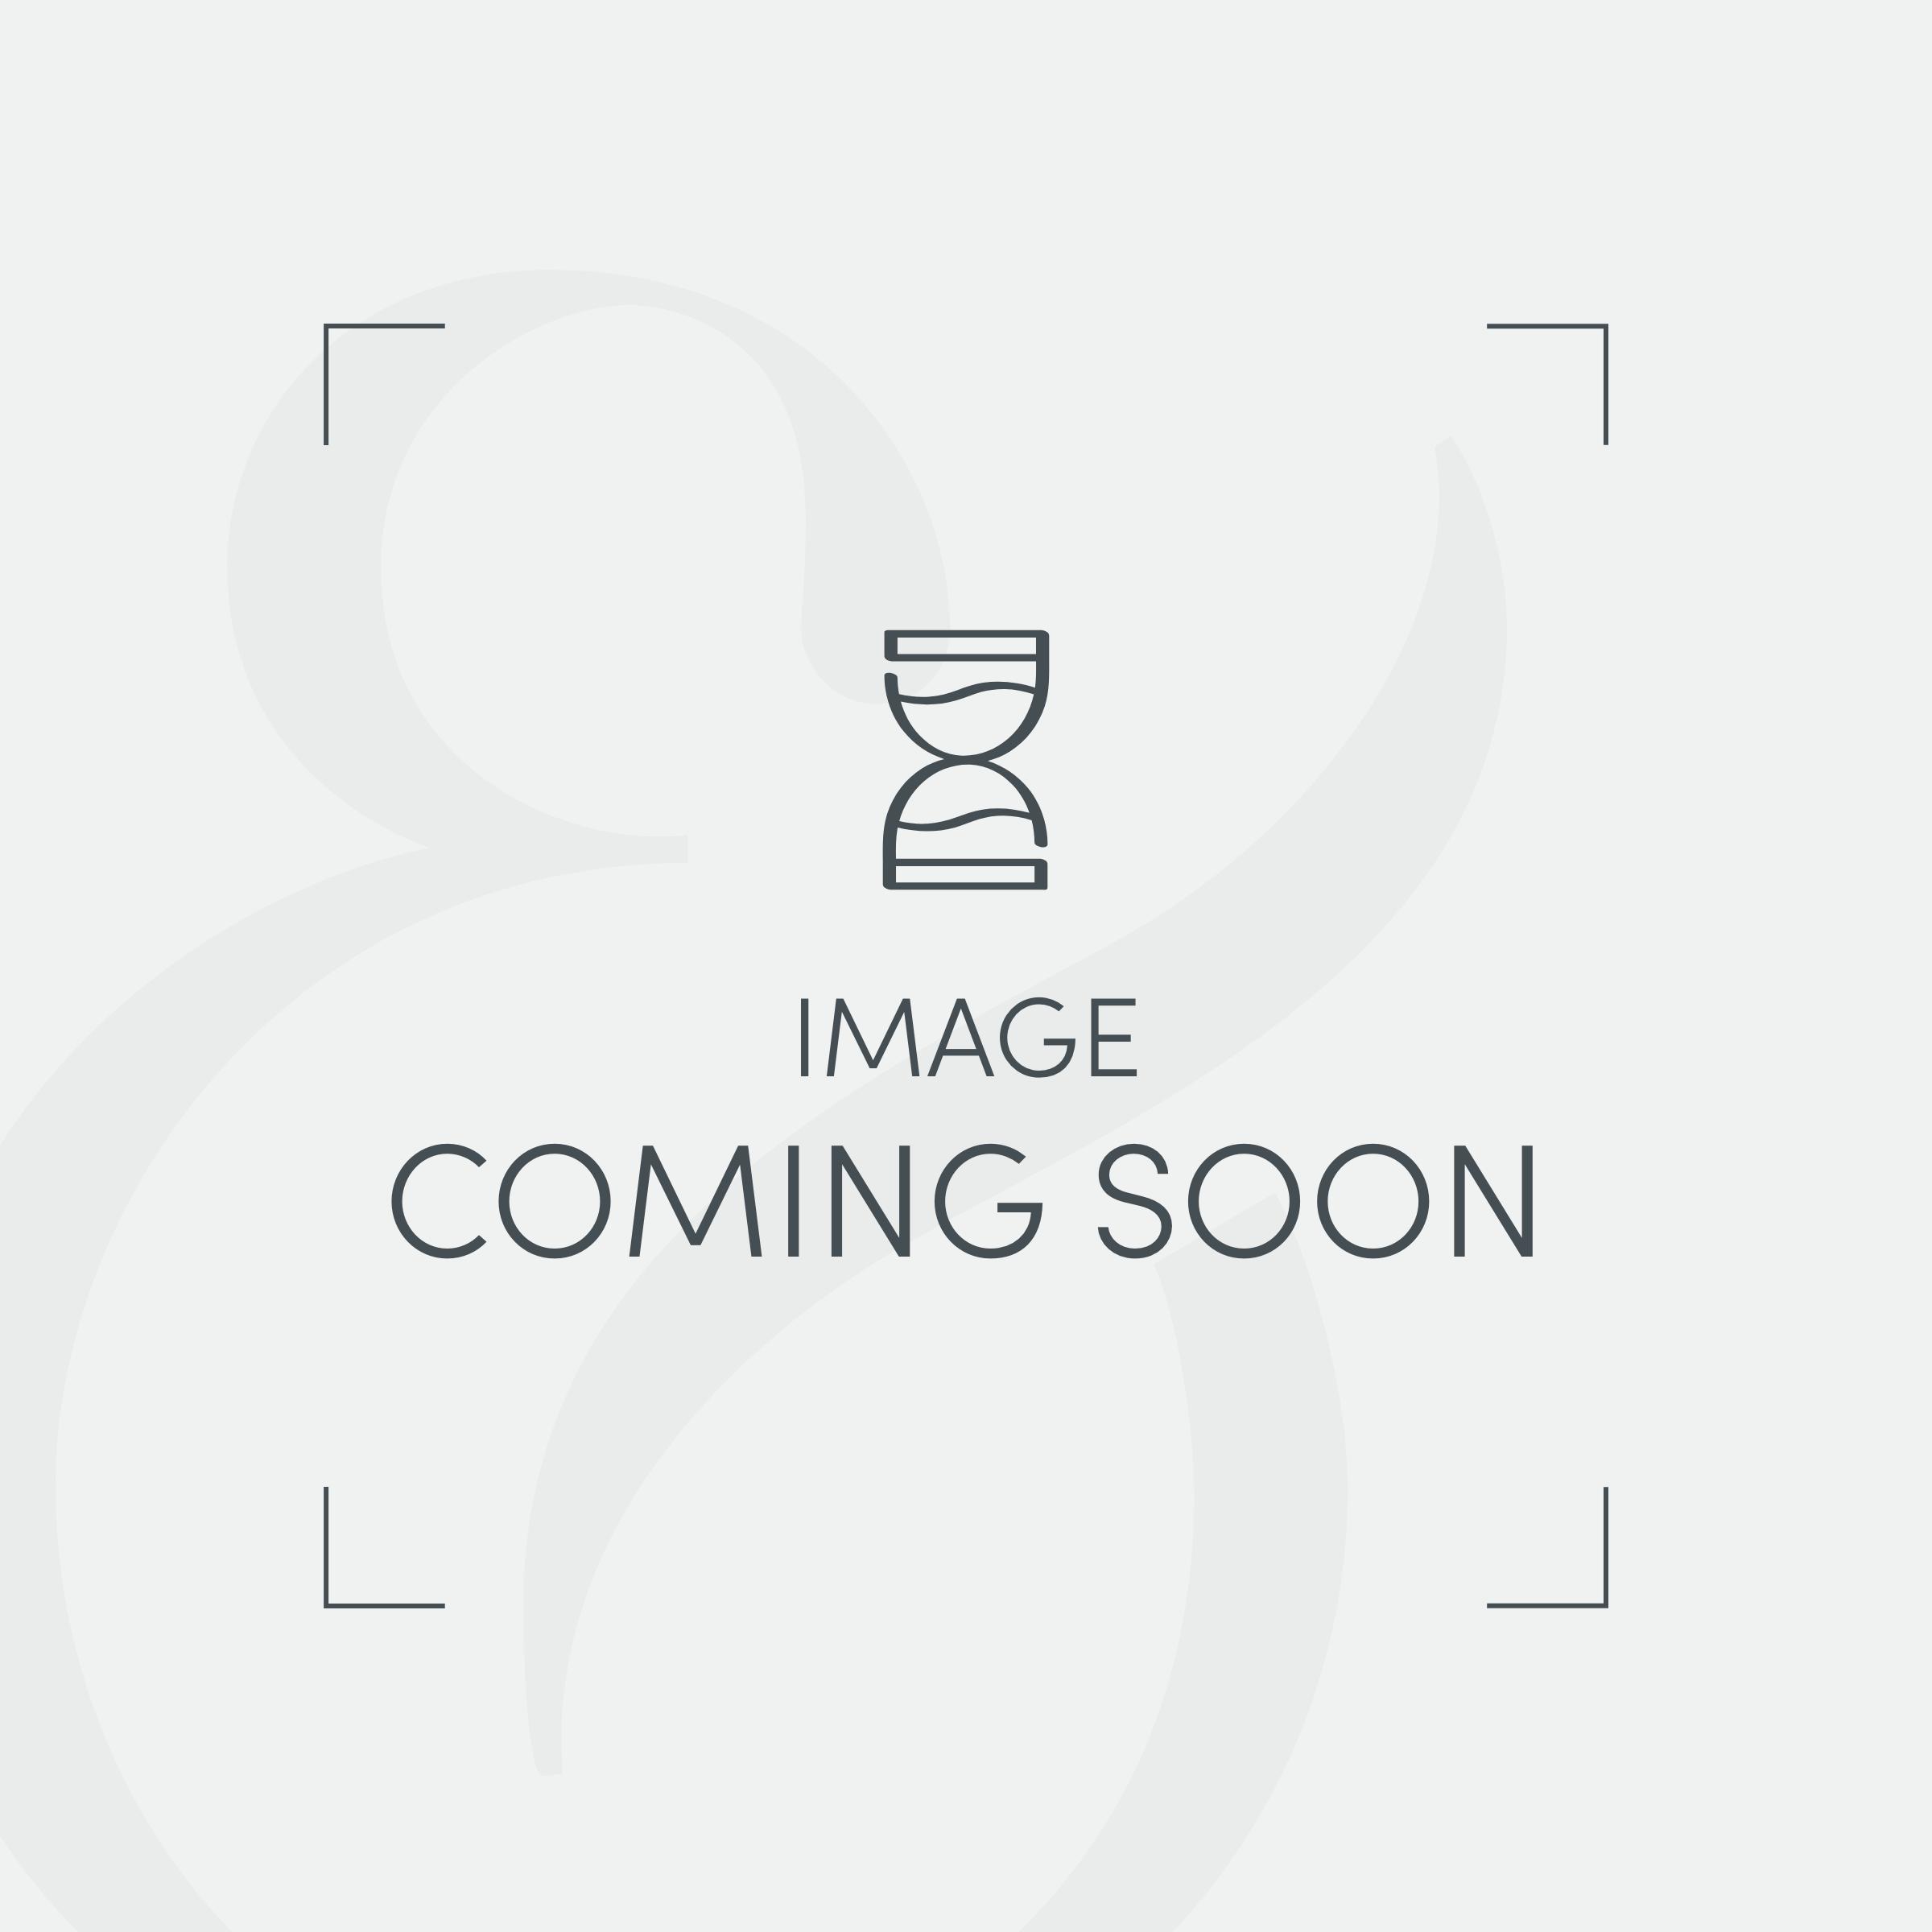 Luxury 600TC Egyptian Cotton Bed Set - Dark Grey - Superking (Duvet Cover, Standard Oxford Pillowcase Pair)